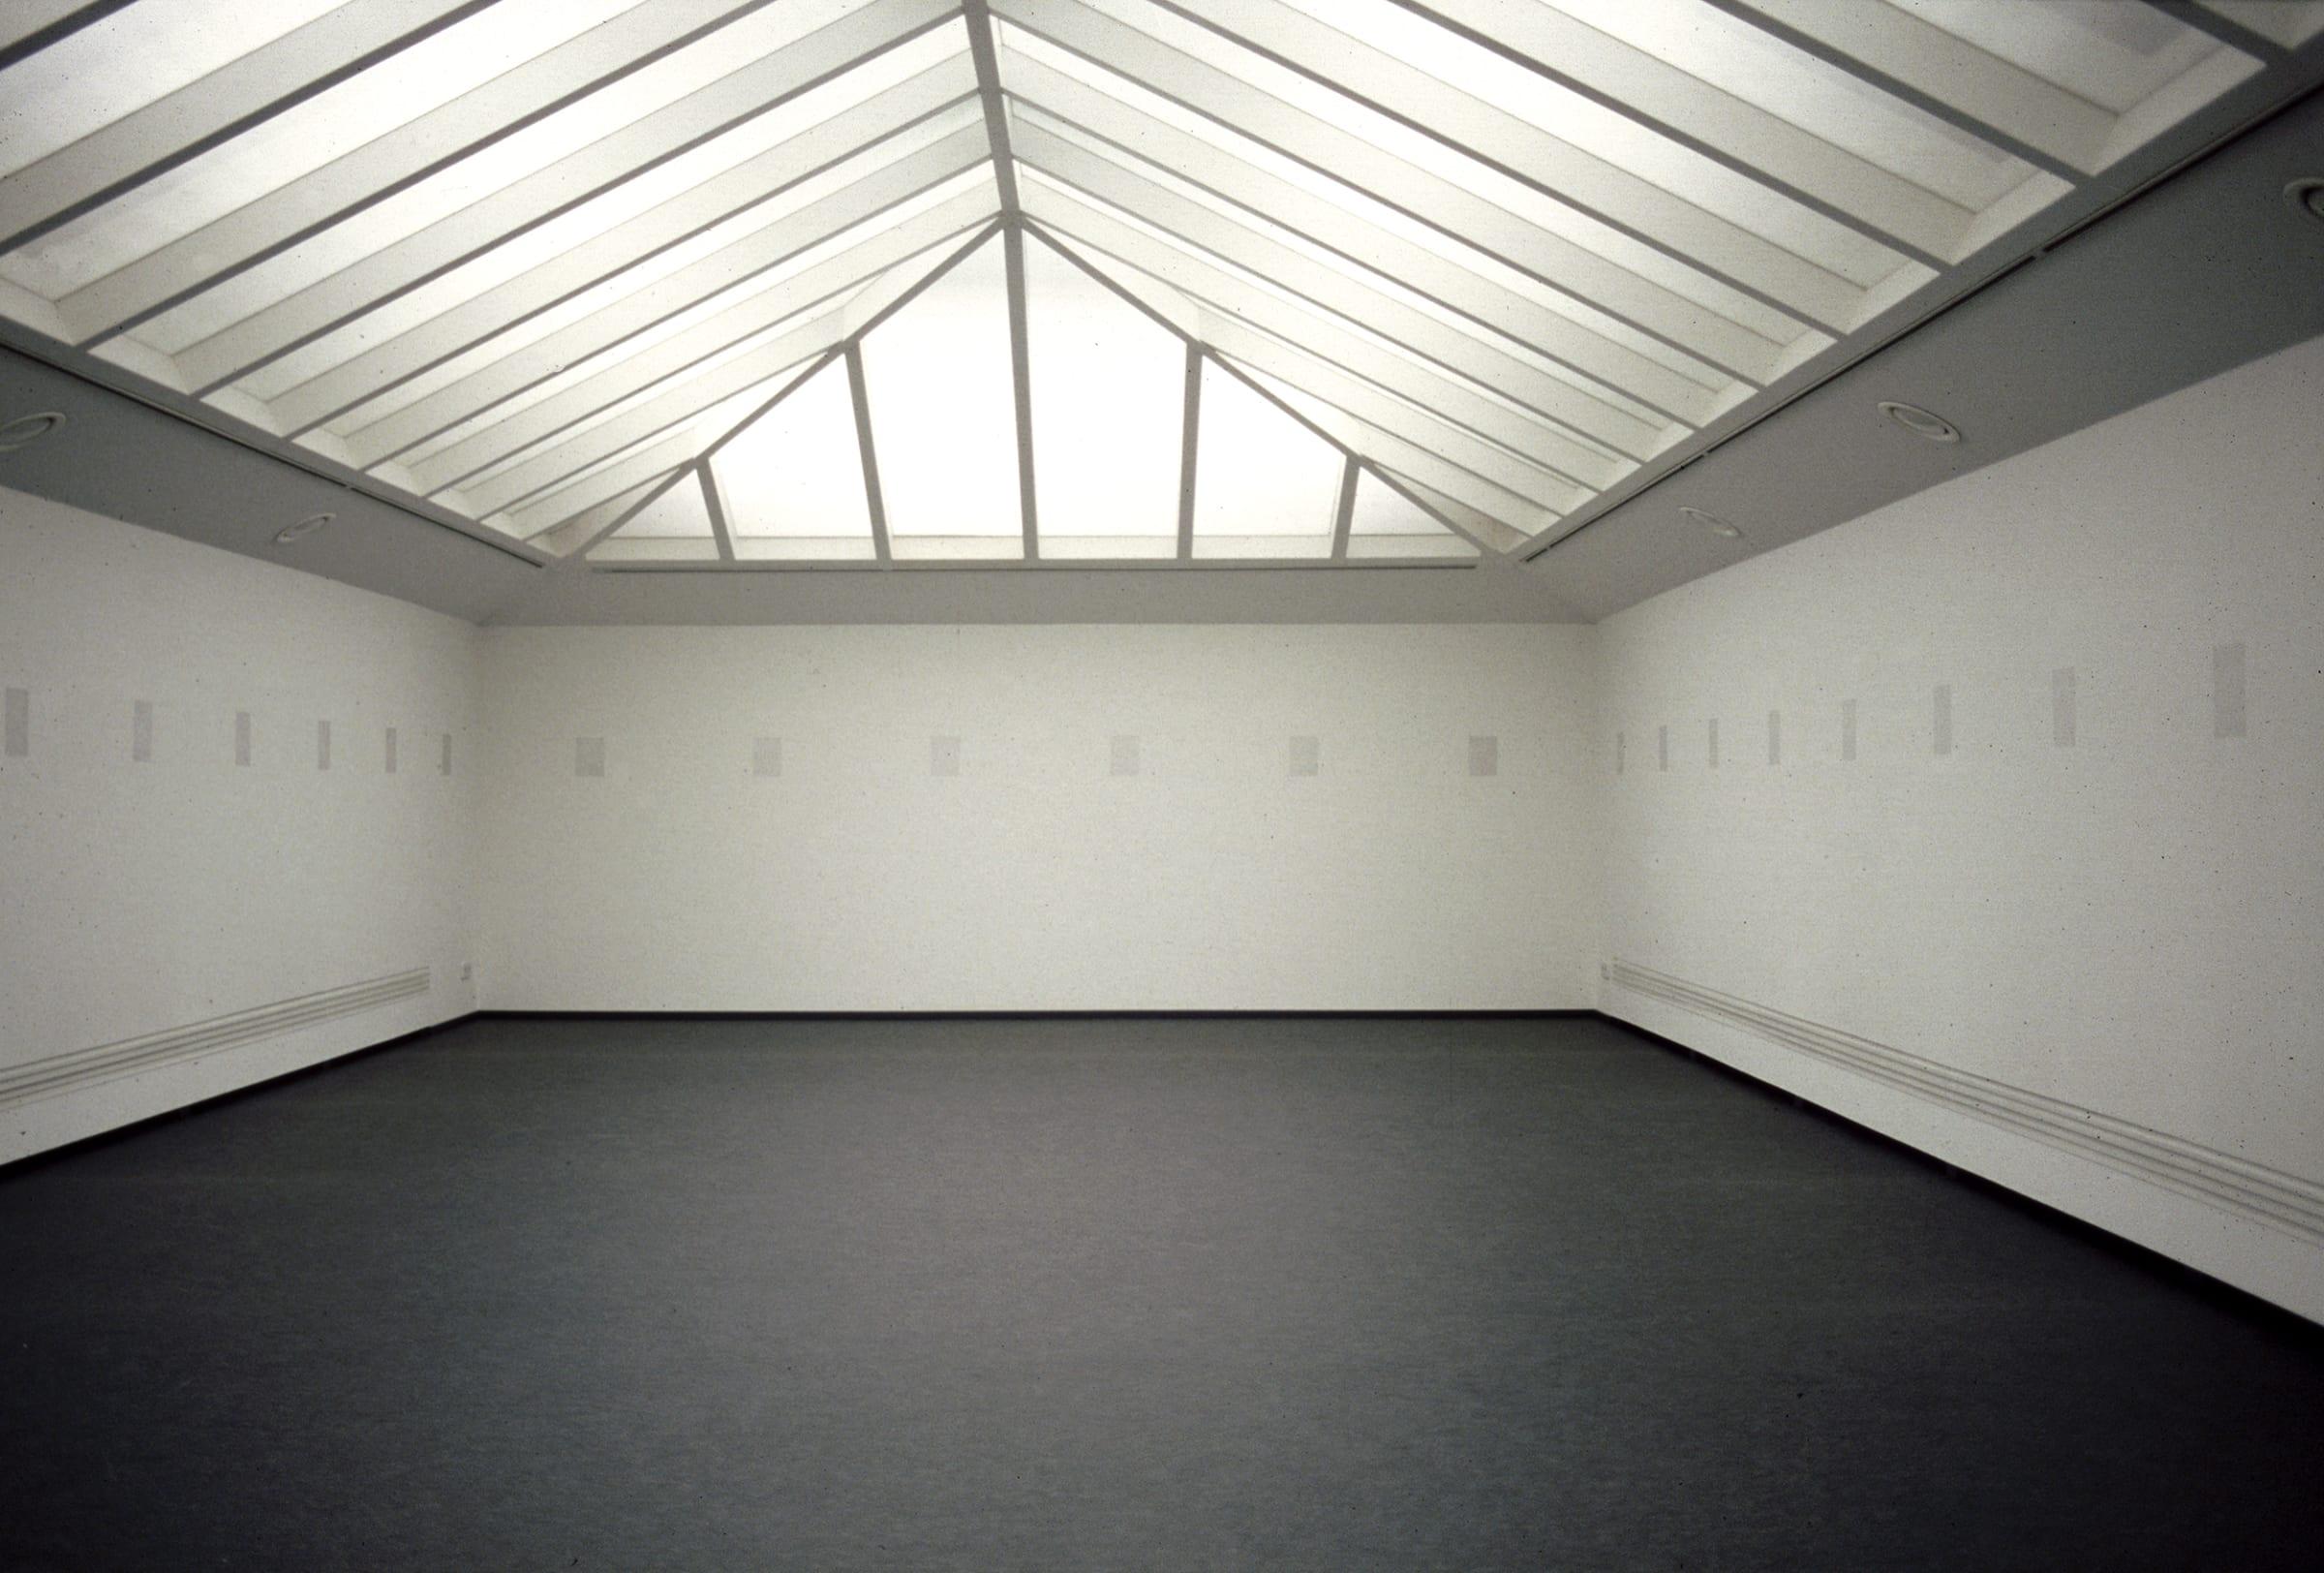 "<span class=""link fancybox-details-link""><a href=""/artists/130-ingolfur-arnarsson/works/15281/"">View Detail Page</a></span><div class=""artist""><strong>INGÓLFUR ARNARSSON</strong></div> 1993 <div class=""medium"">Installation view at Museum Moderner Kunst, Landkreis Cuxhaven, studio a, Otterndorf, Germany</div>"